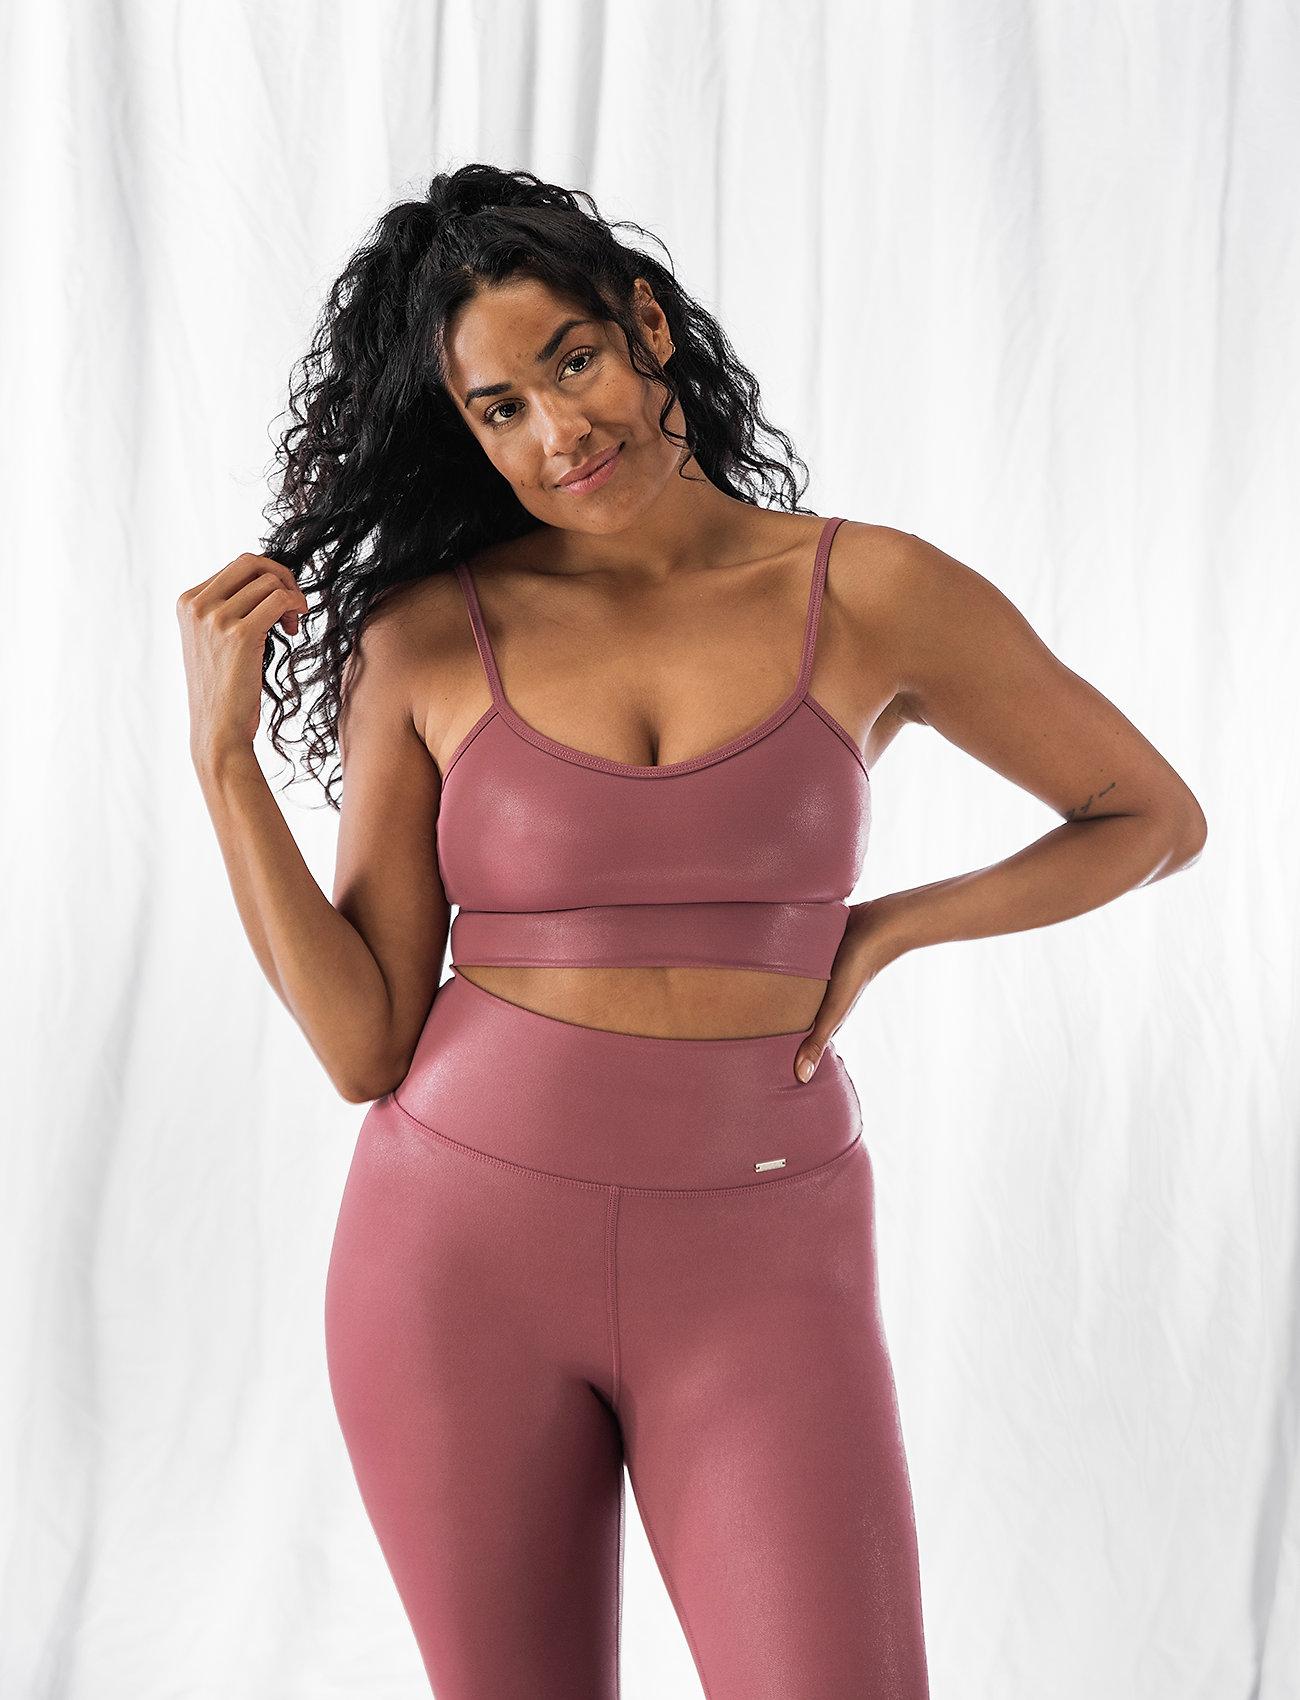 AIM'N - Pink Beat Shine On Strap Bra - sport bras: low - pink - 0